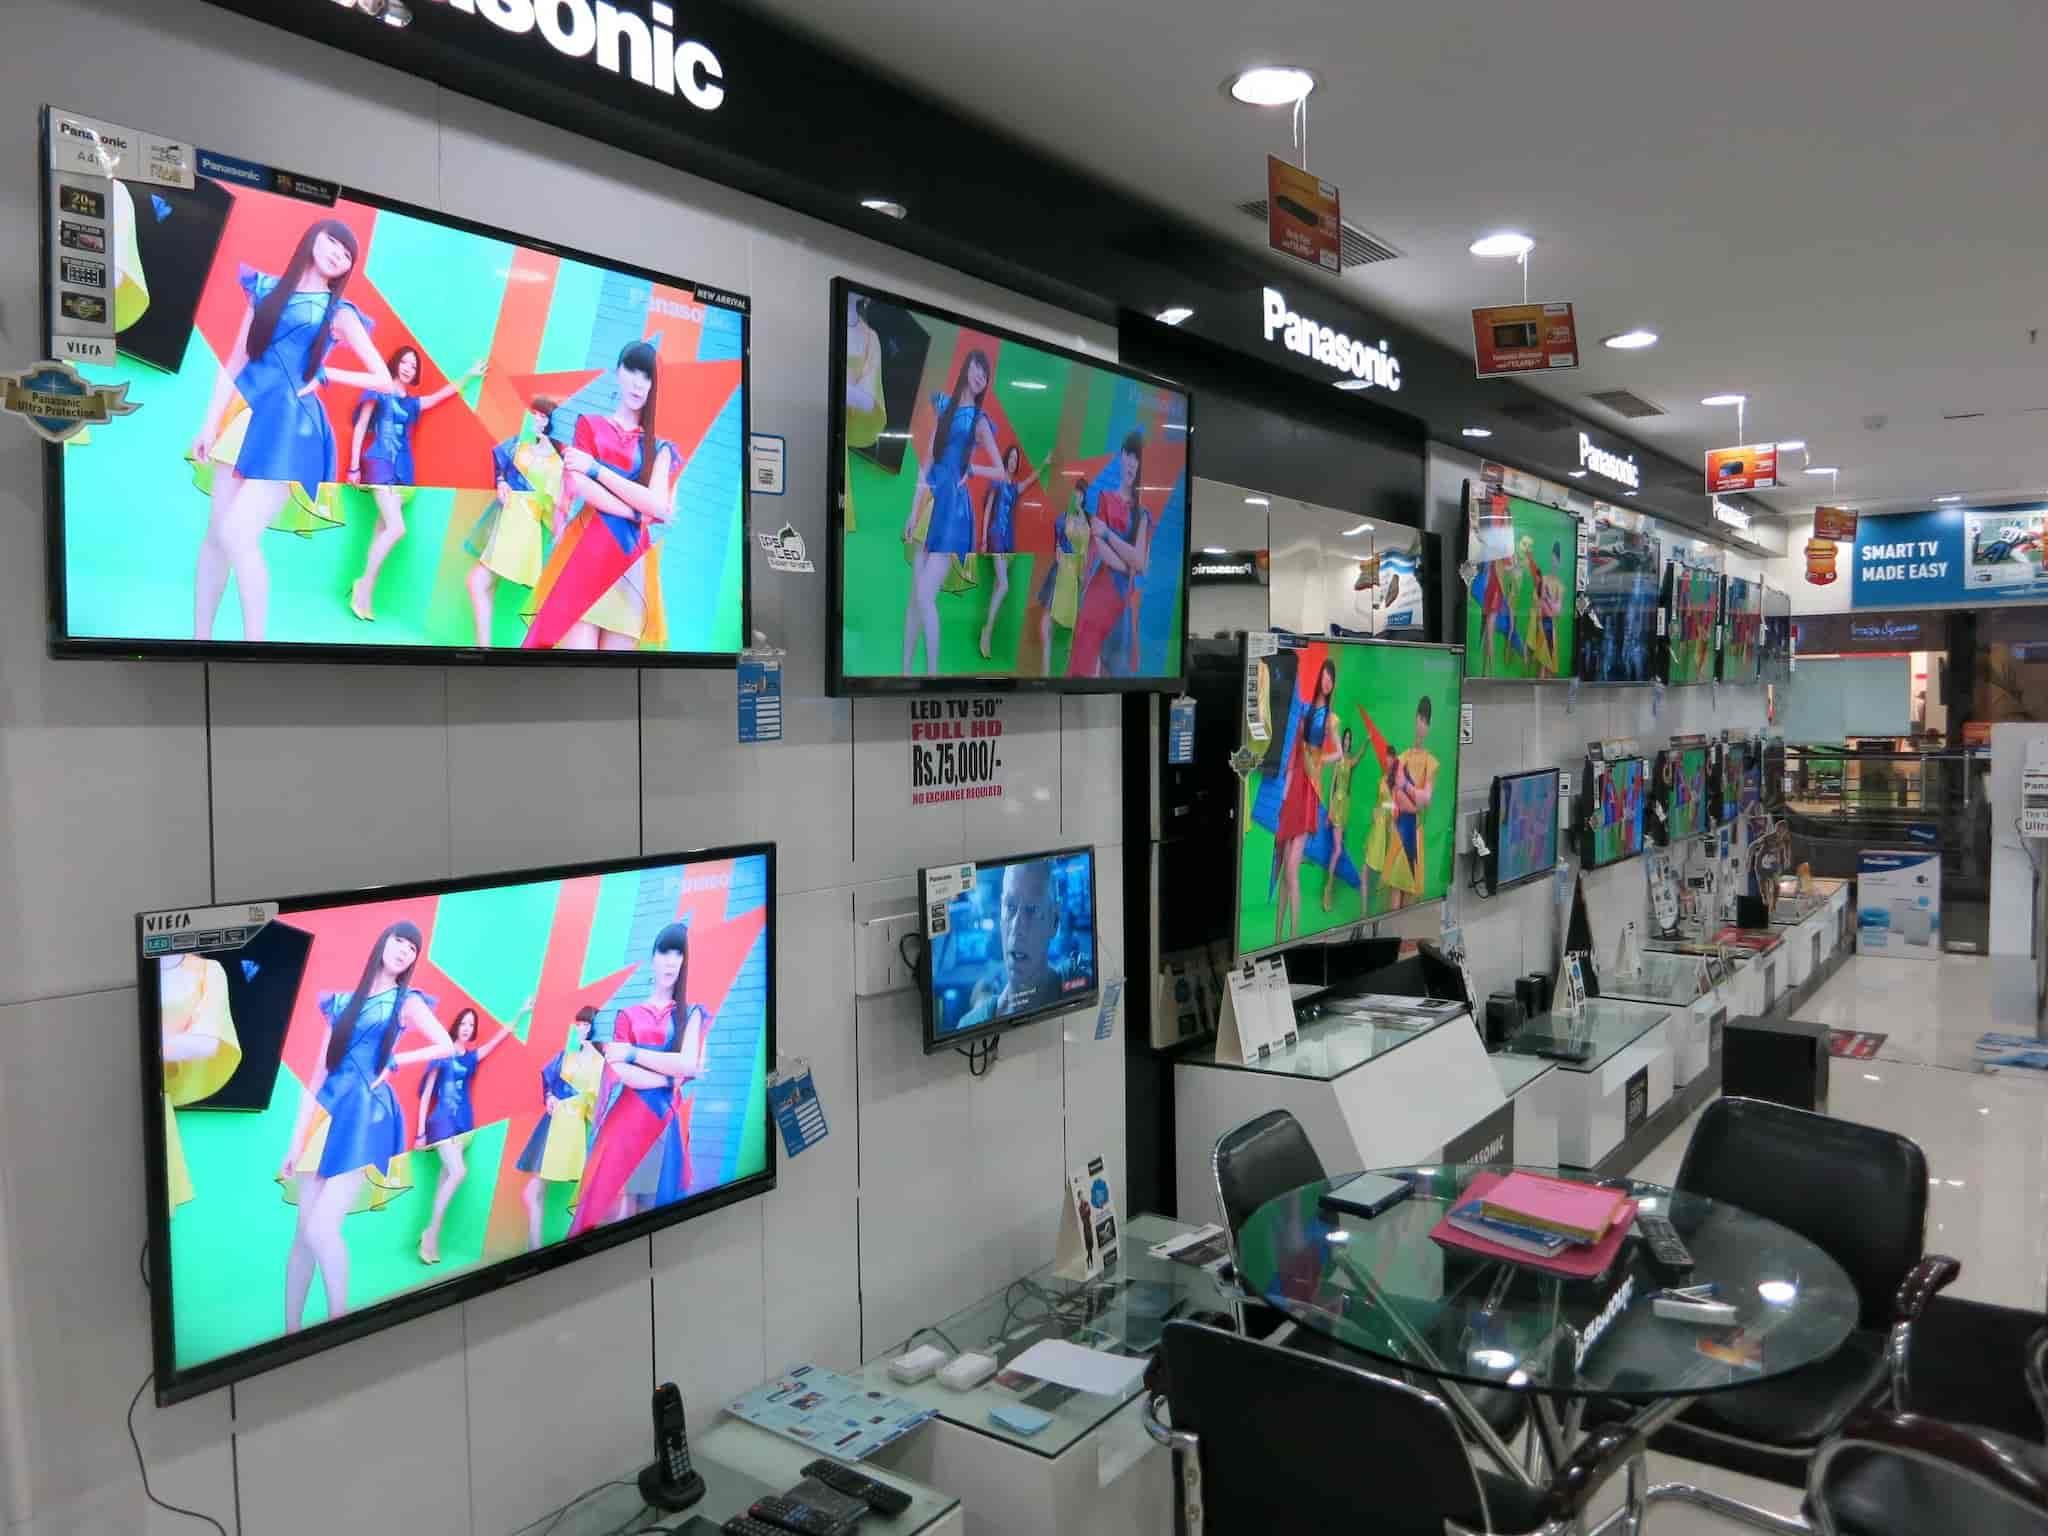 Panasonic Brandshop, Mg Road - Electronic Goods Showrooms in